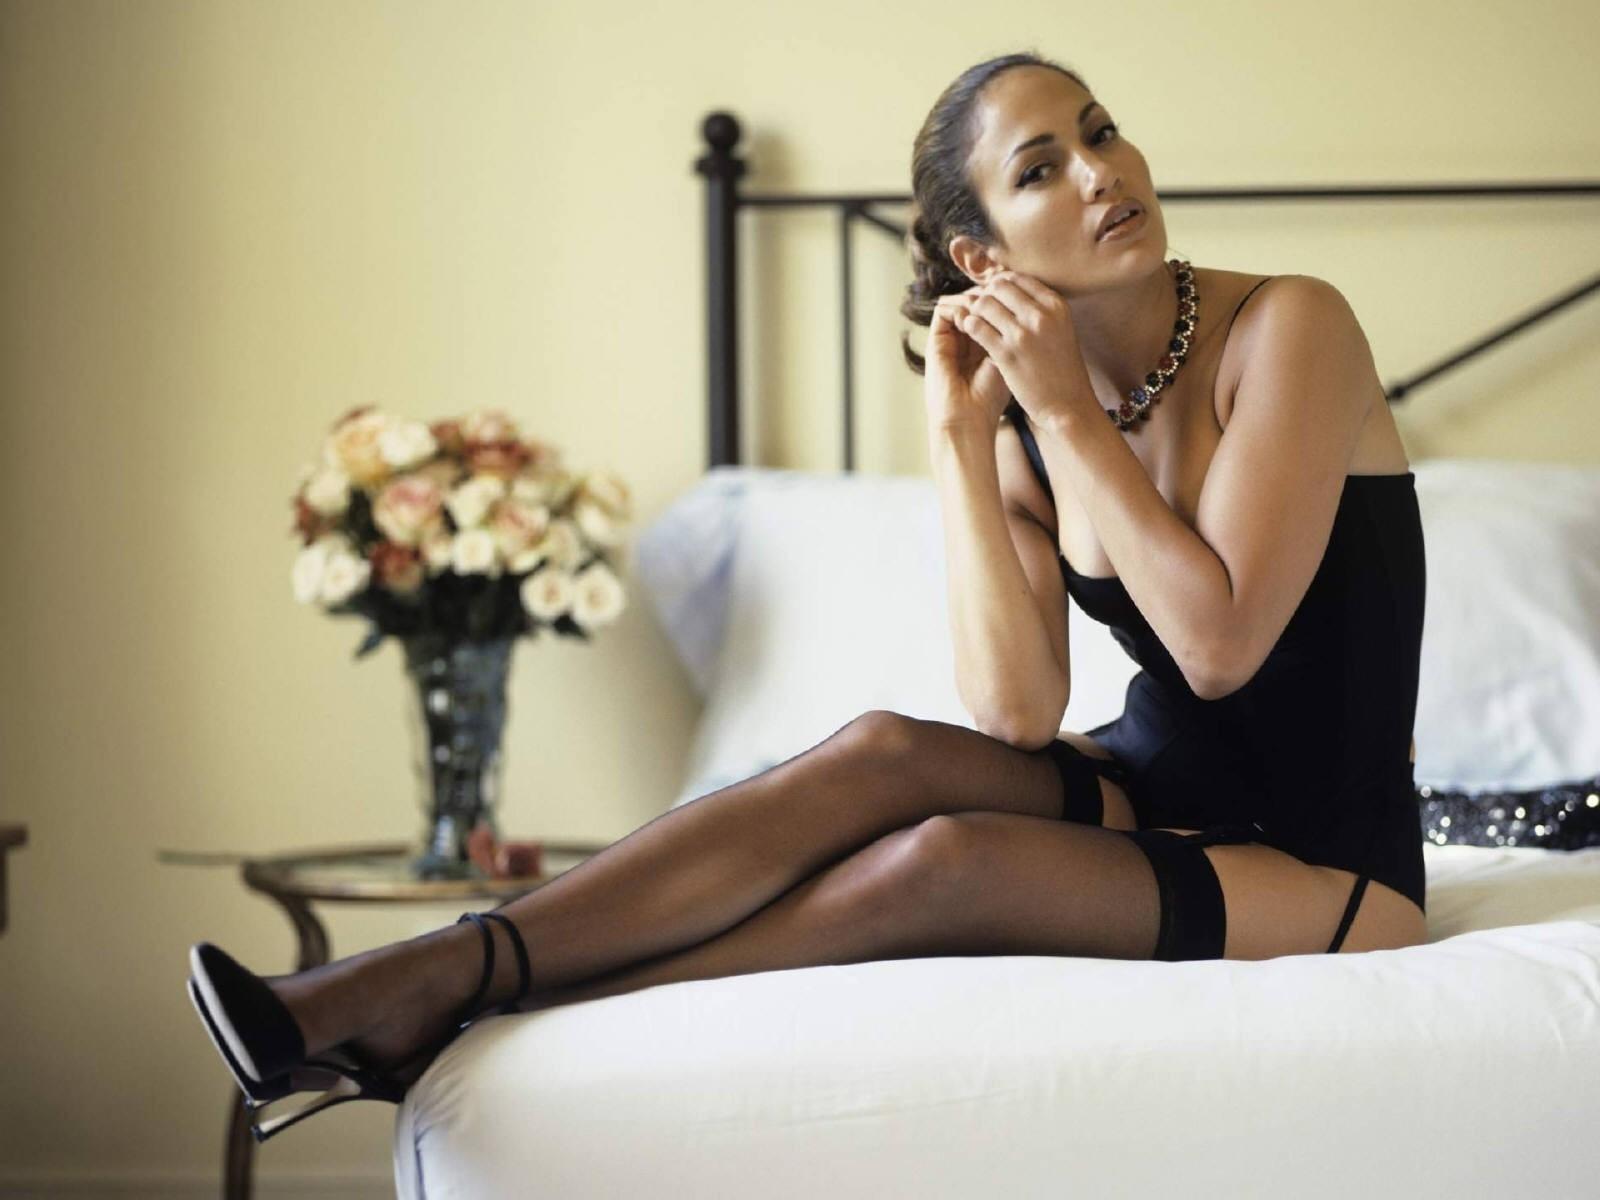 Wallpaper di Jennifer Lopez in reggicalze e lingerie nera